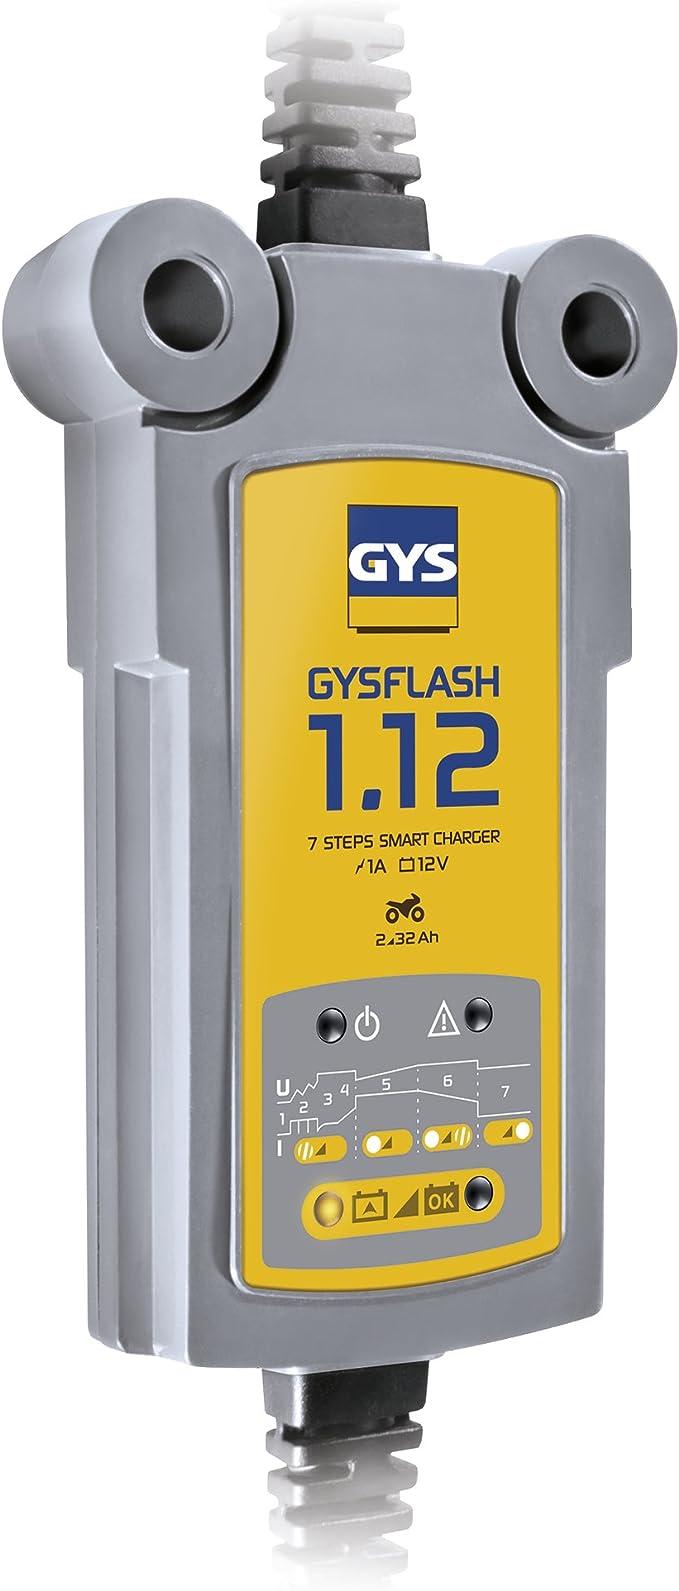 Gys 029361 Batterieladegerät Gysflash 1 12 Auto